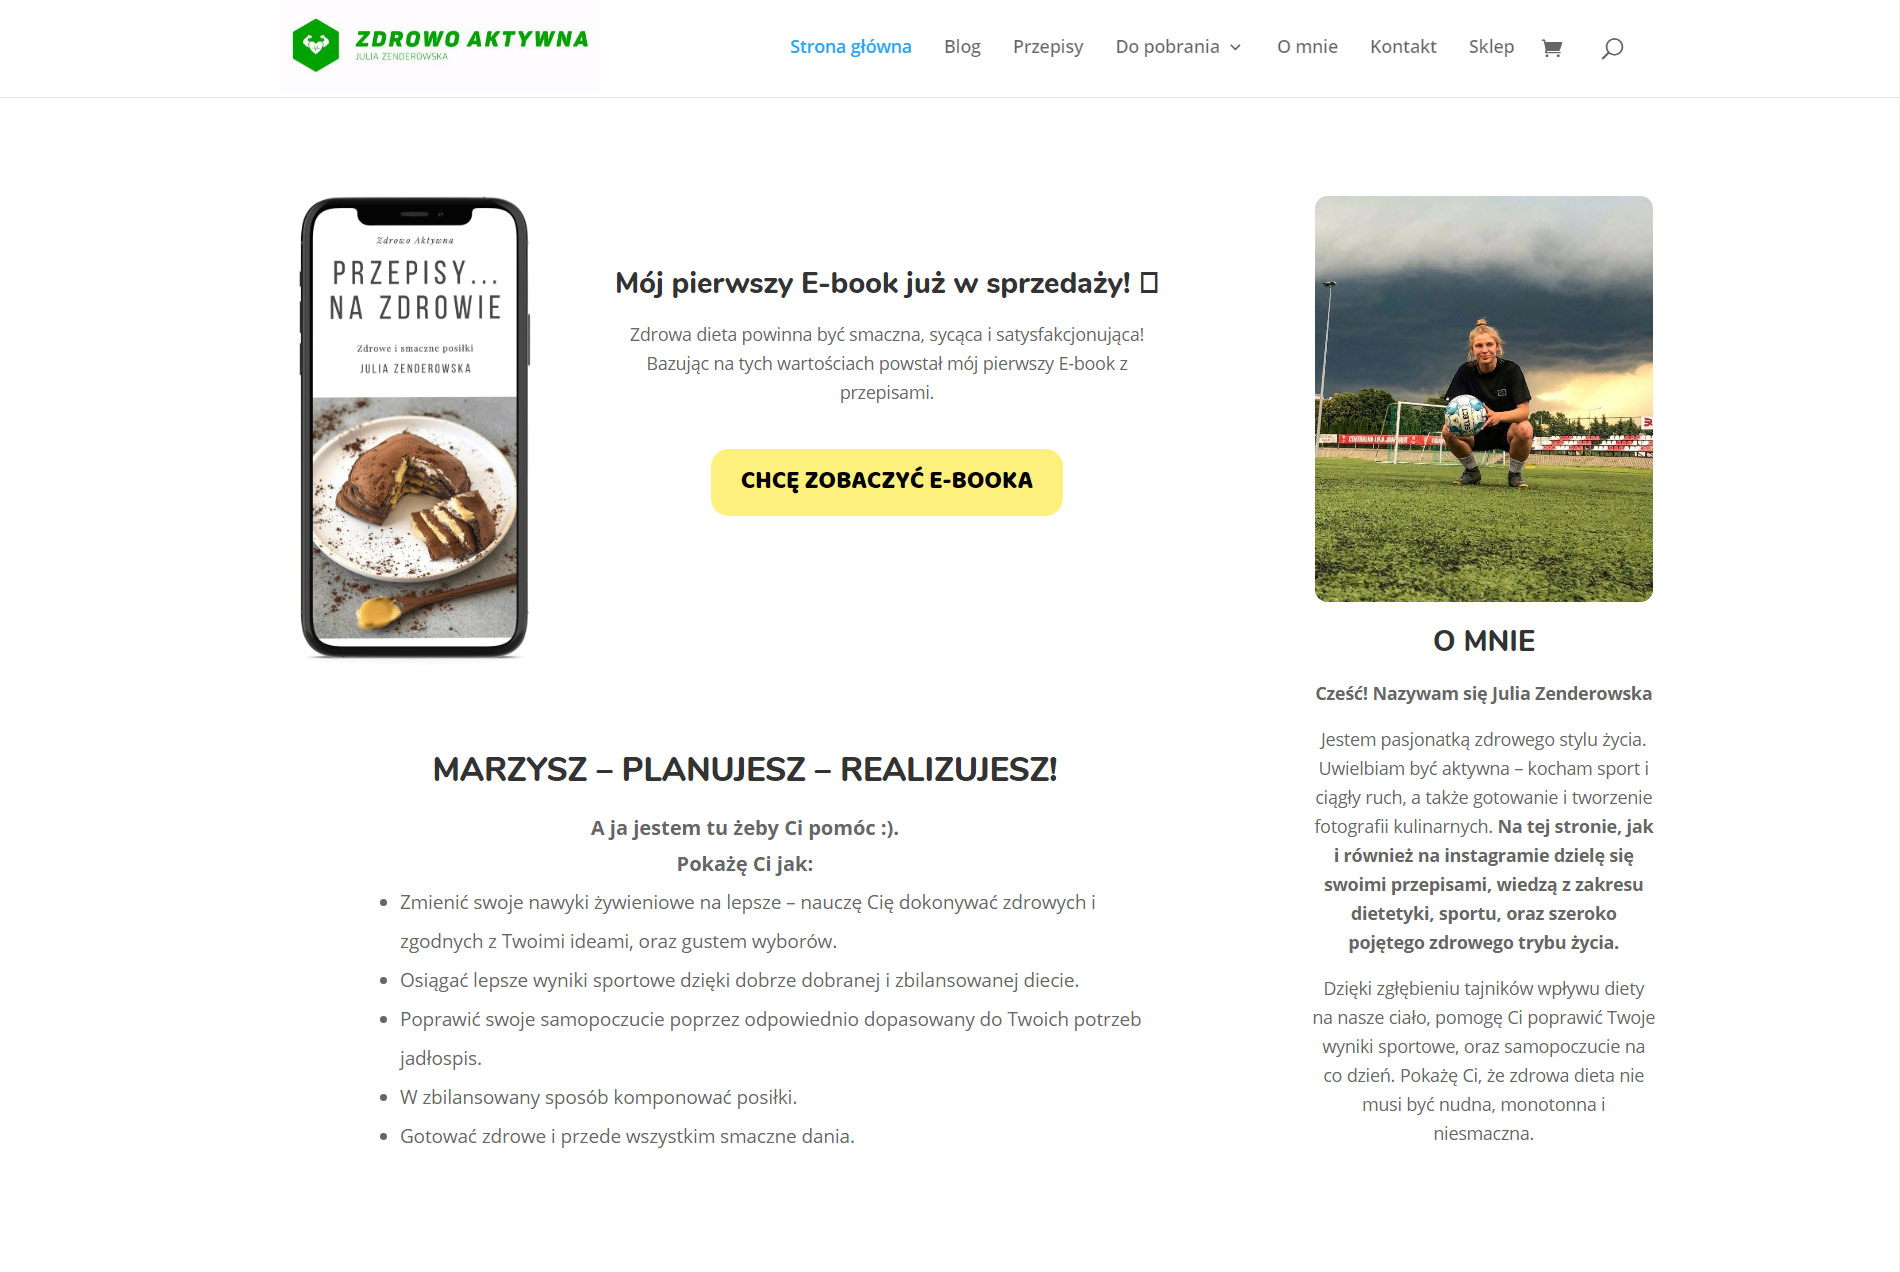 Zdrowo aktywna case study